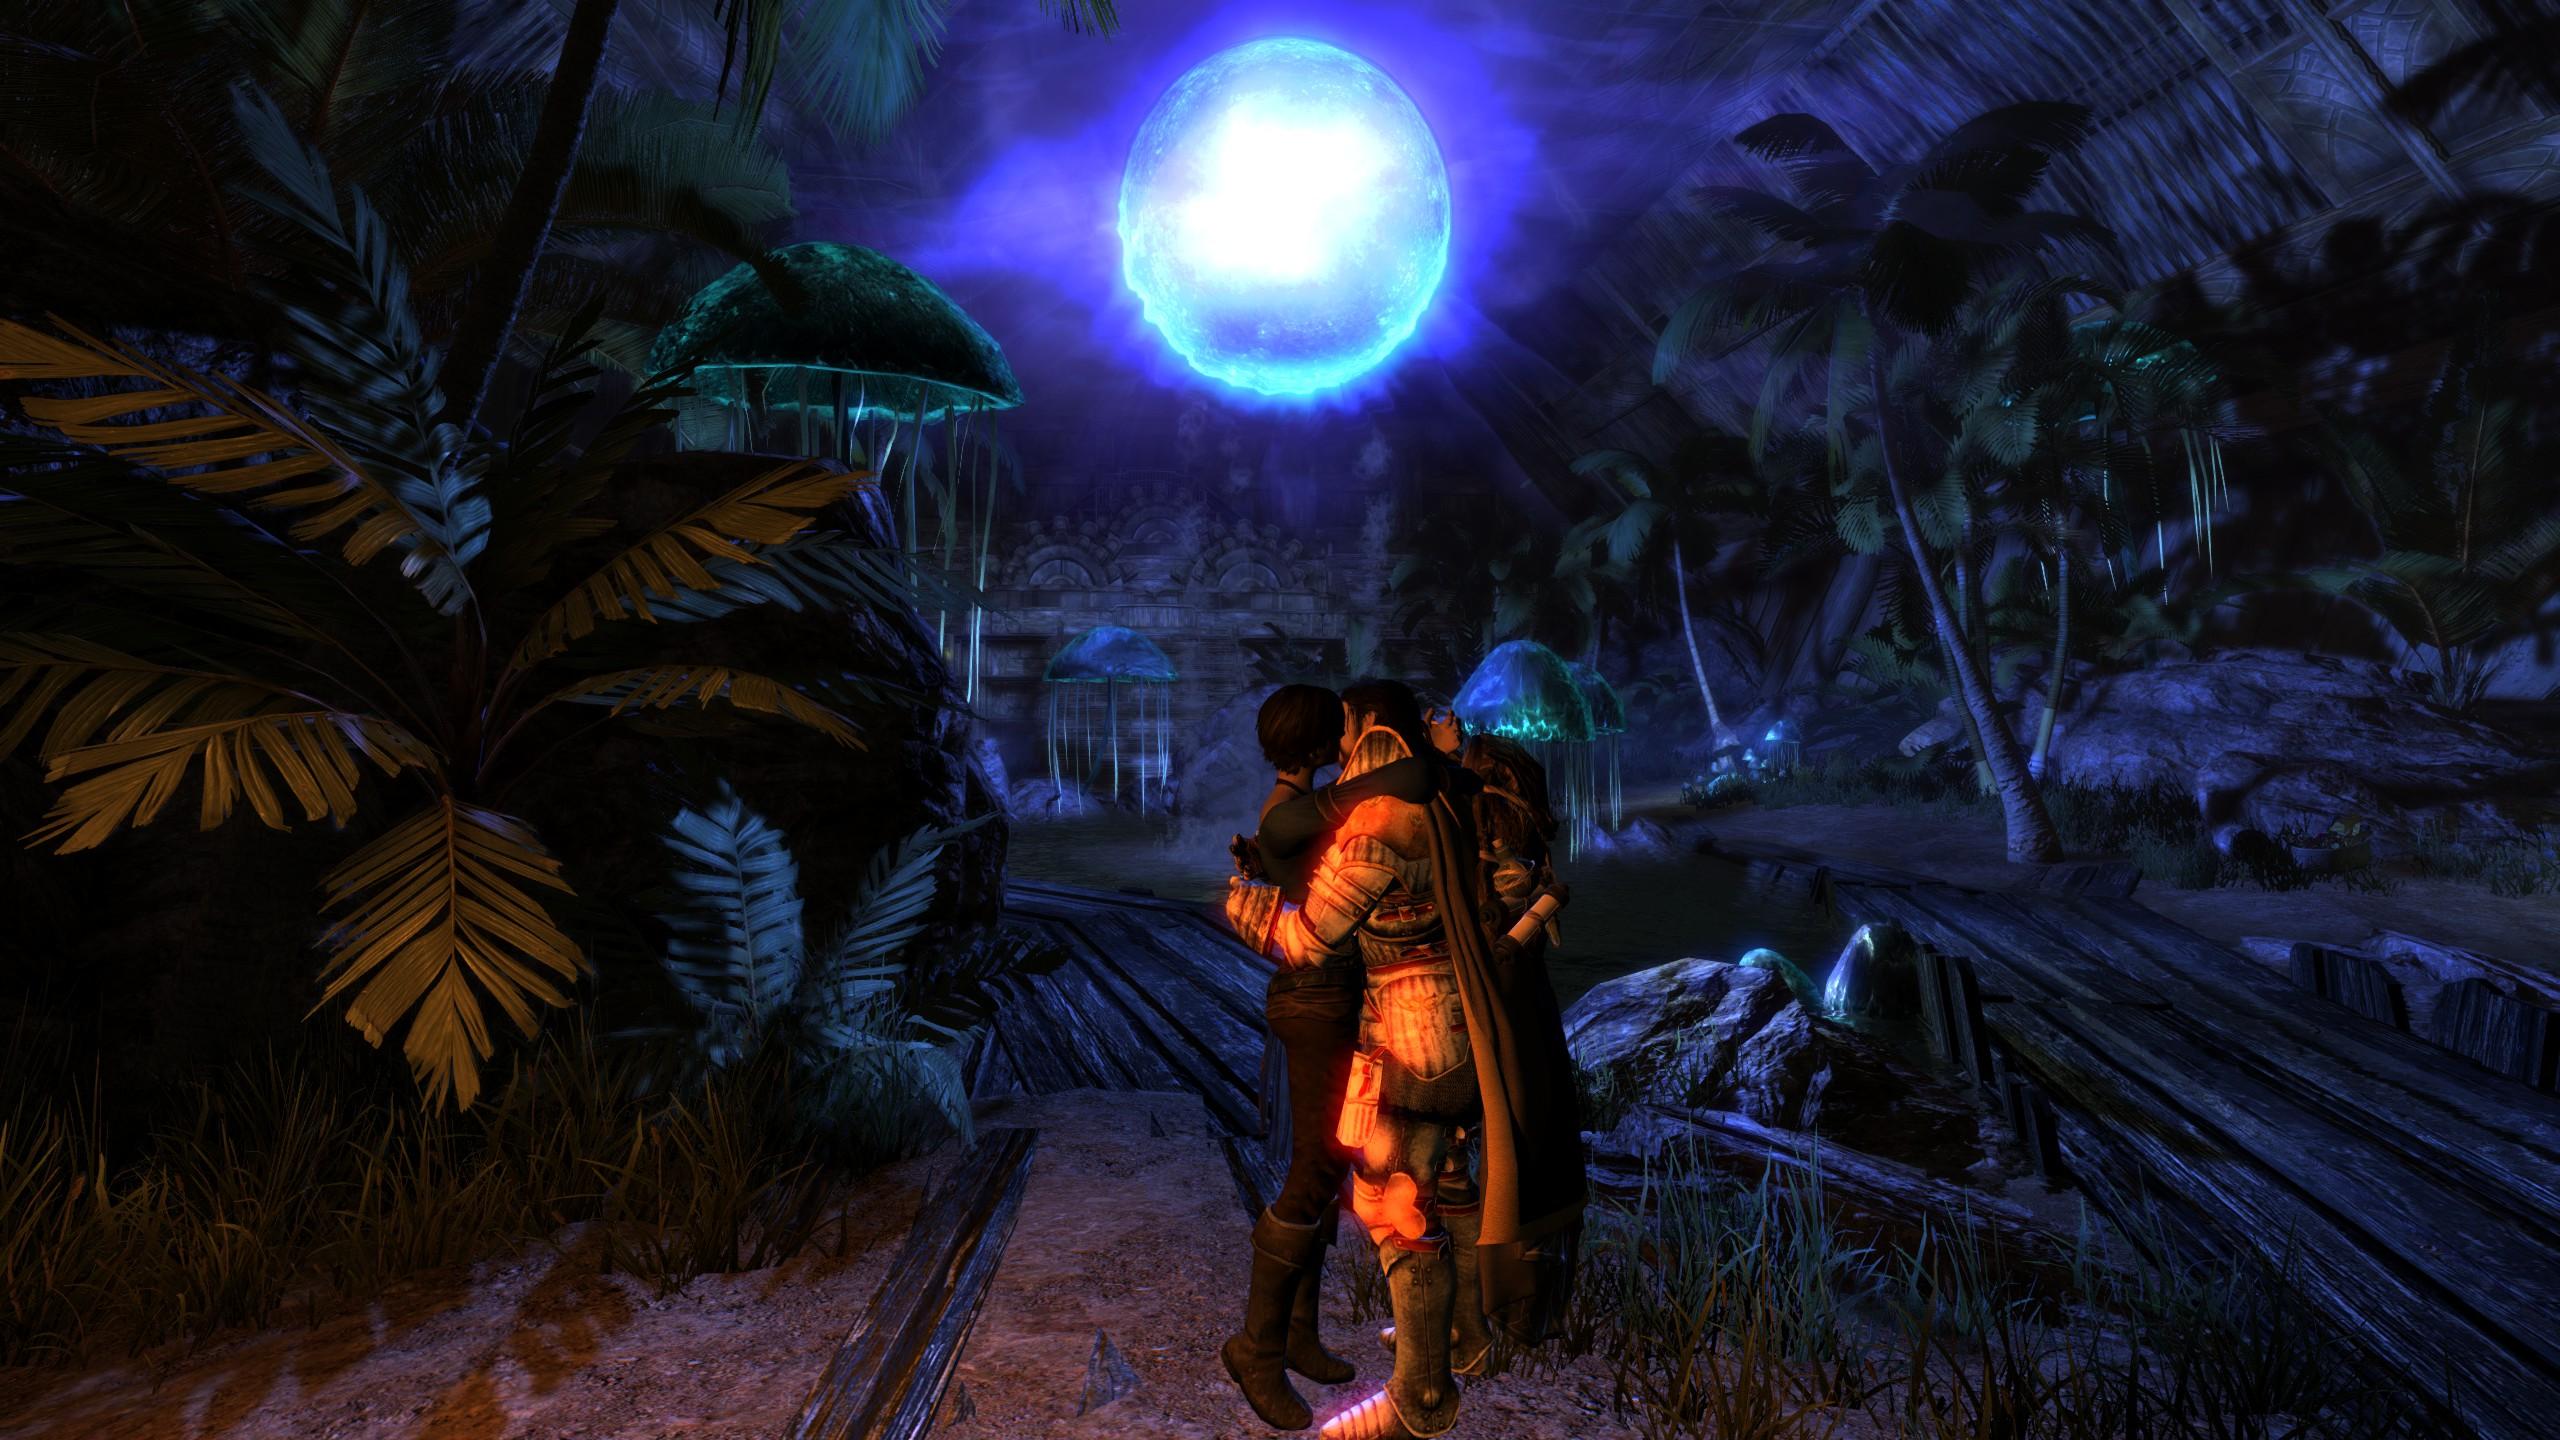 И тут романтикометр взорвался - Elder Scrolls 5: Skyrim, the